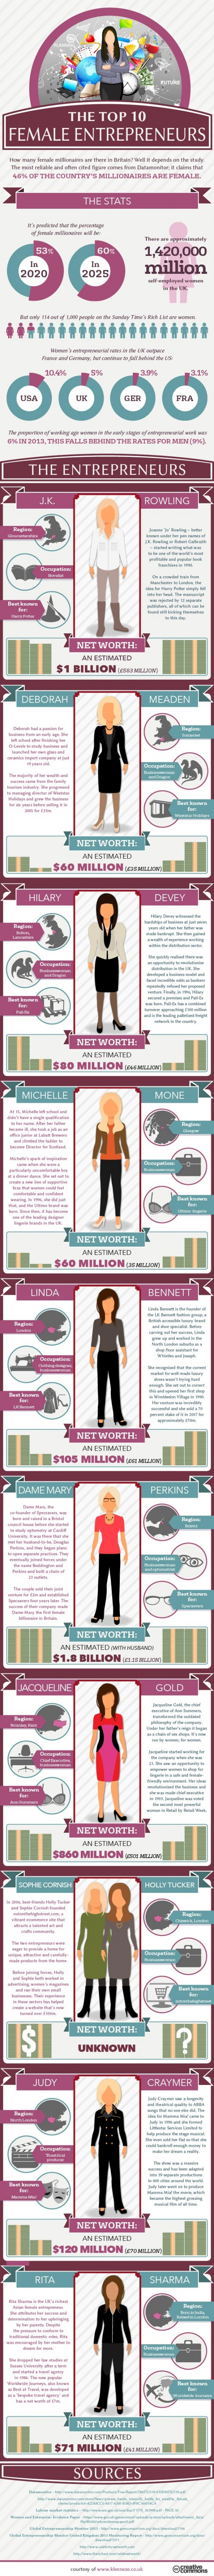 The-Top-Female-Entrepreneures_main